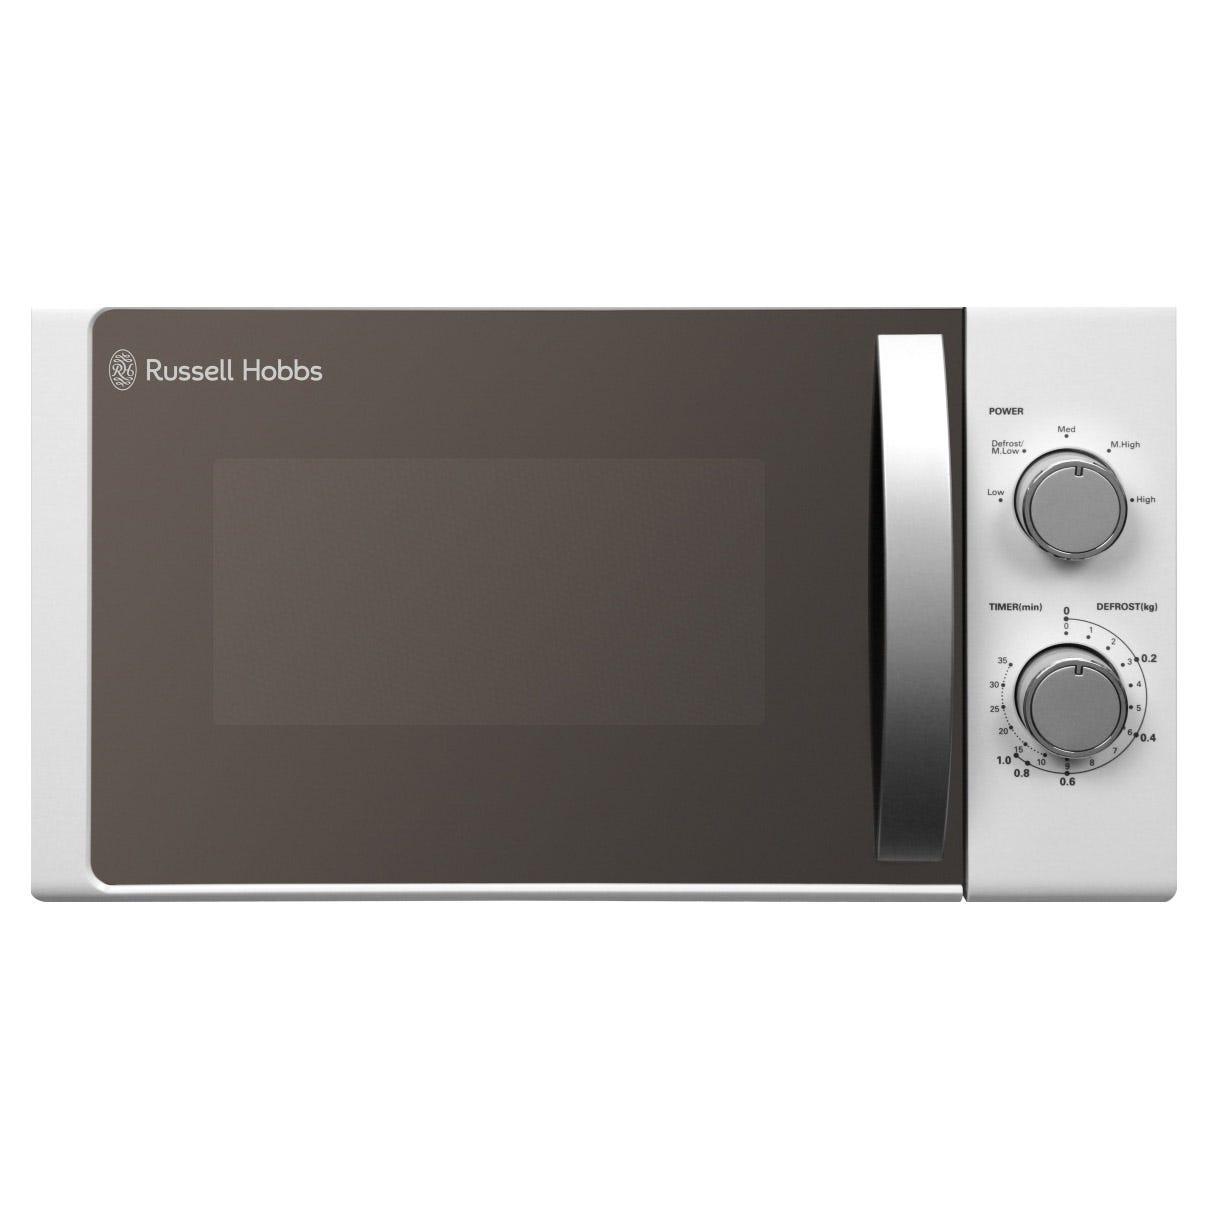 Russell Hobbs RHM2073 20L Manual Microwave, 20L